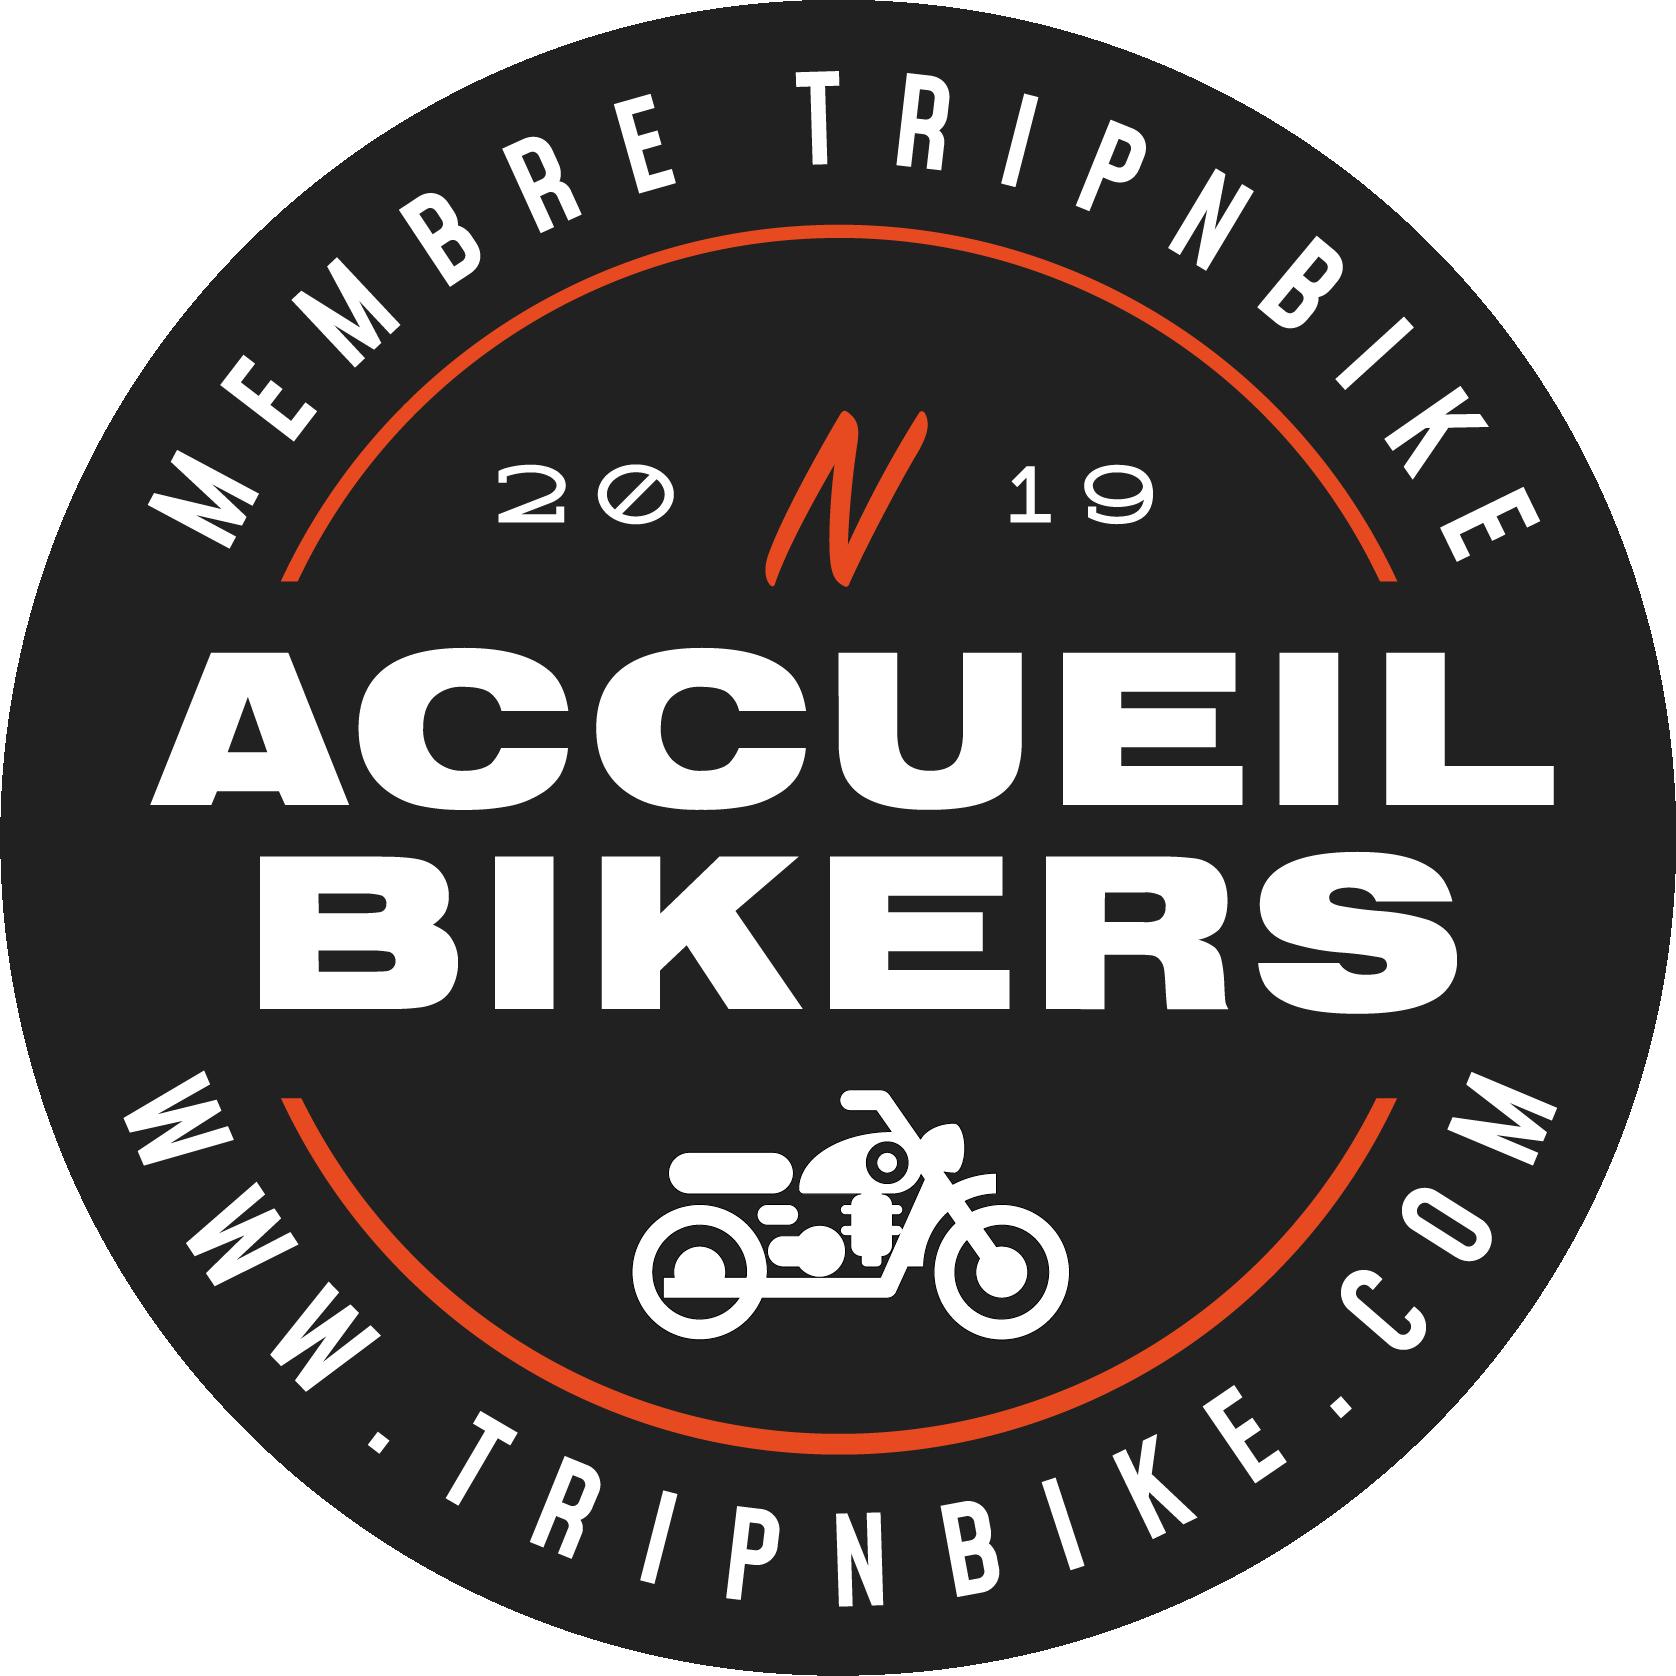 tripnbike